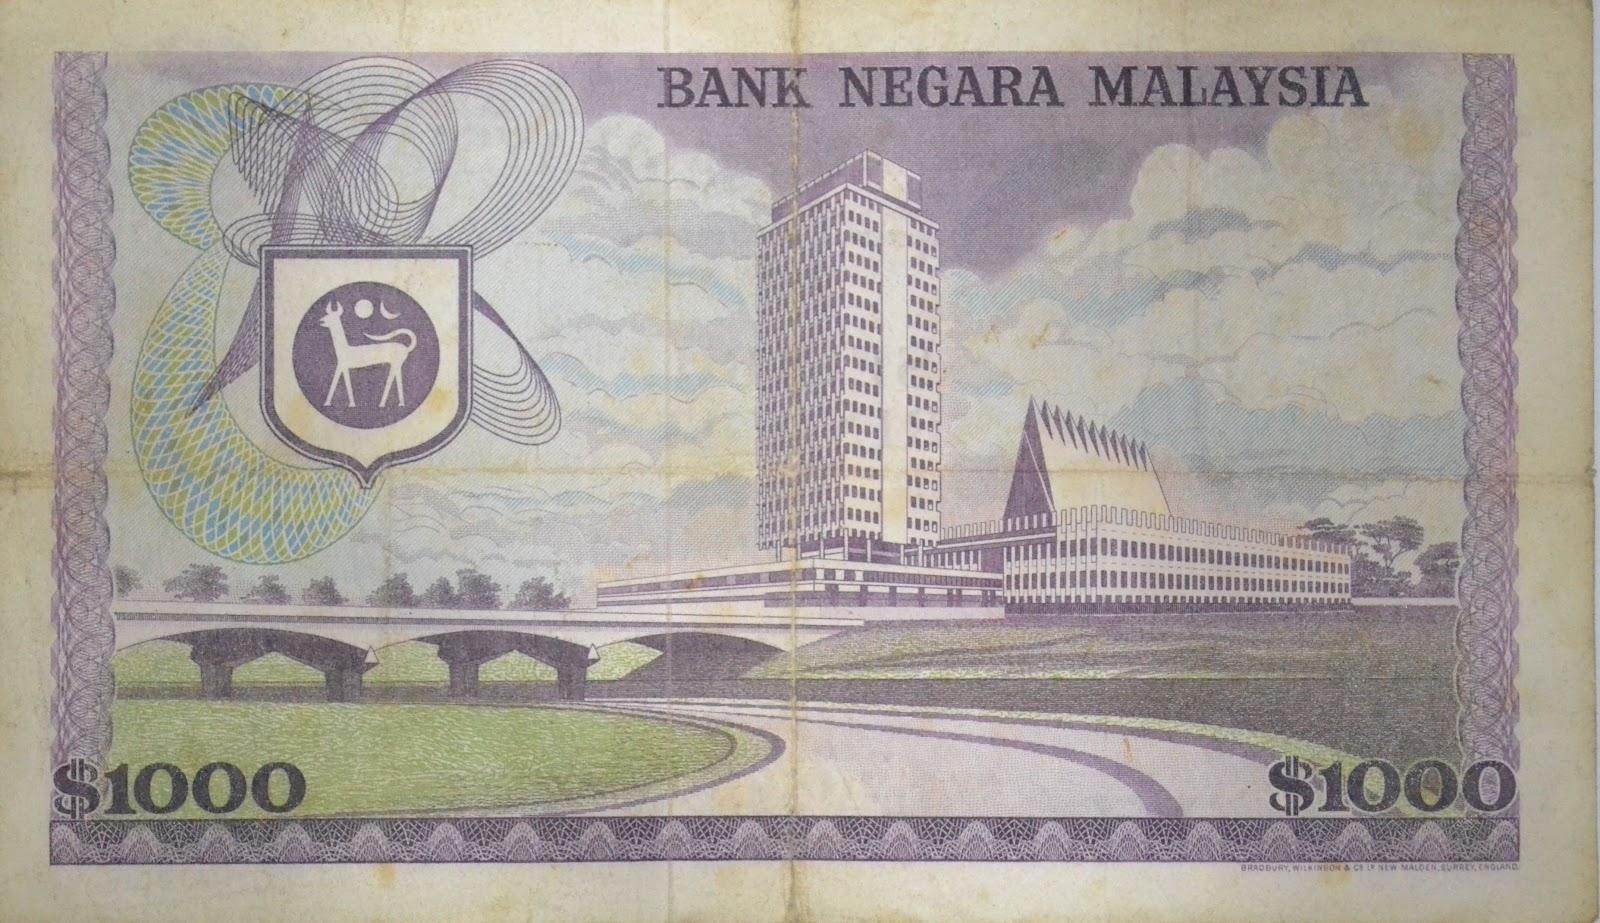 Galeri Sha Banknote DUIT RM 1000 MALAYSIA 1967  1998